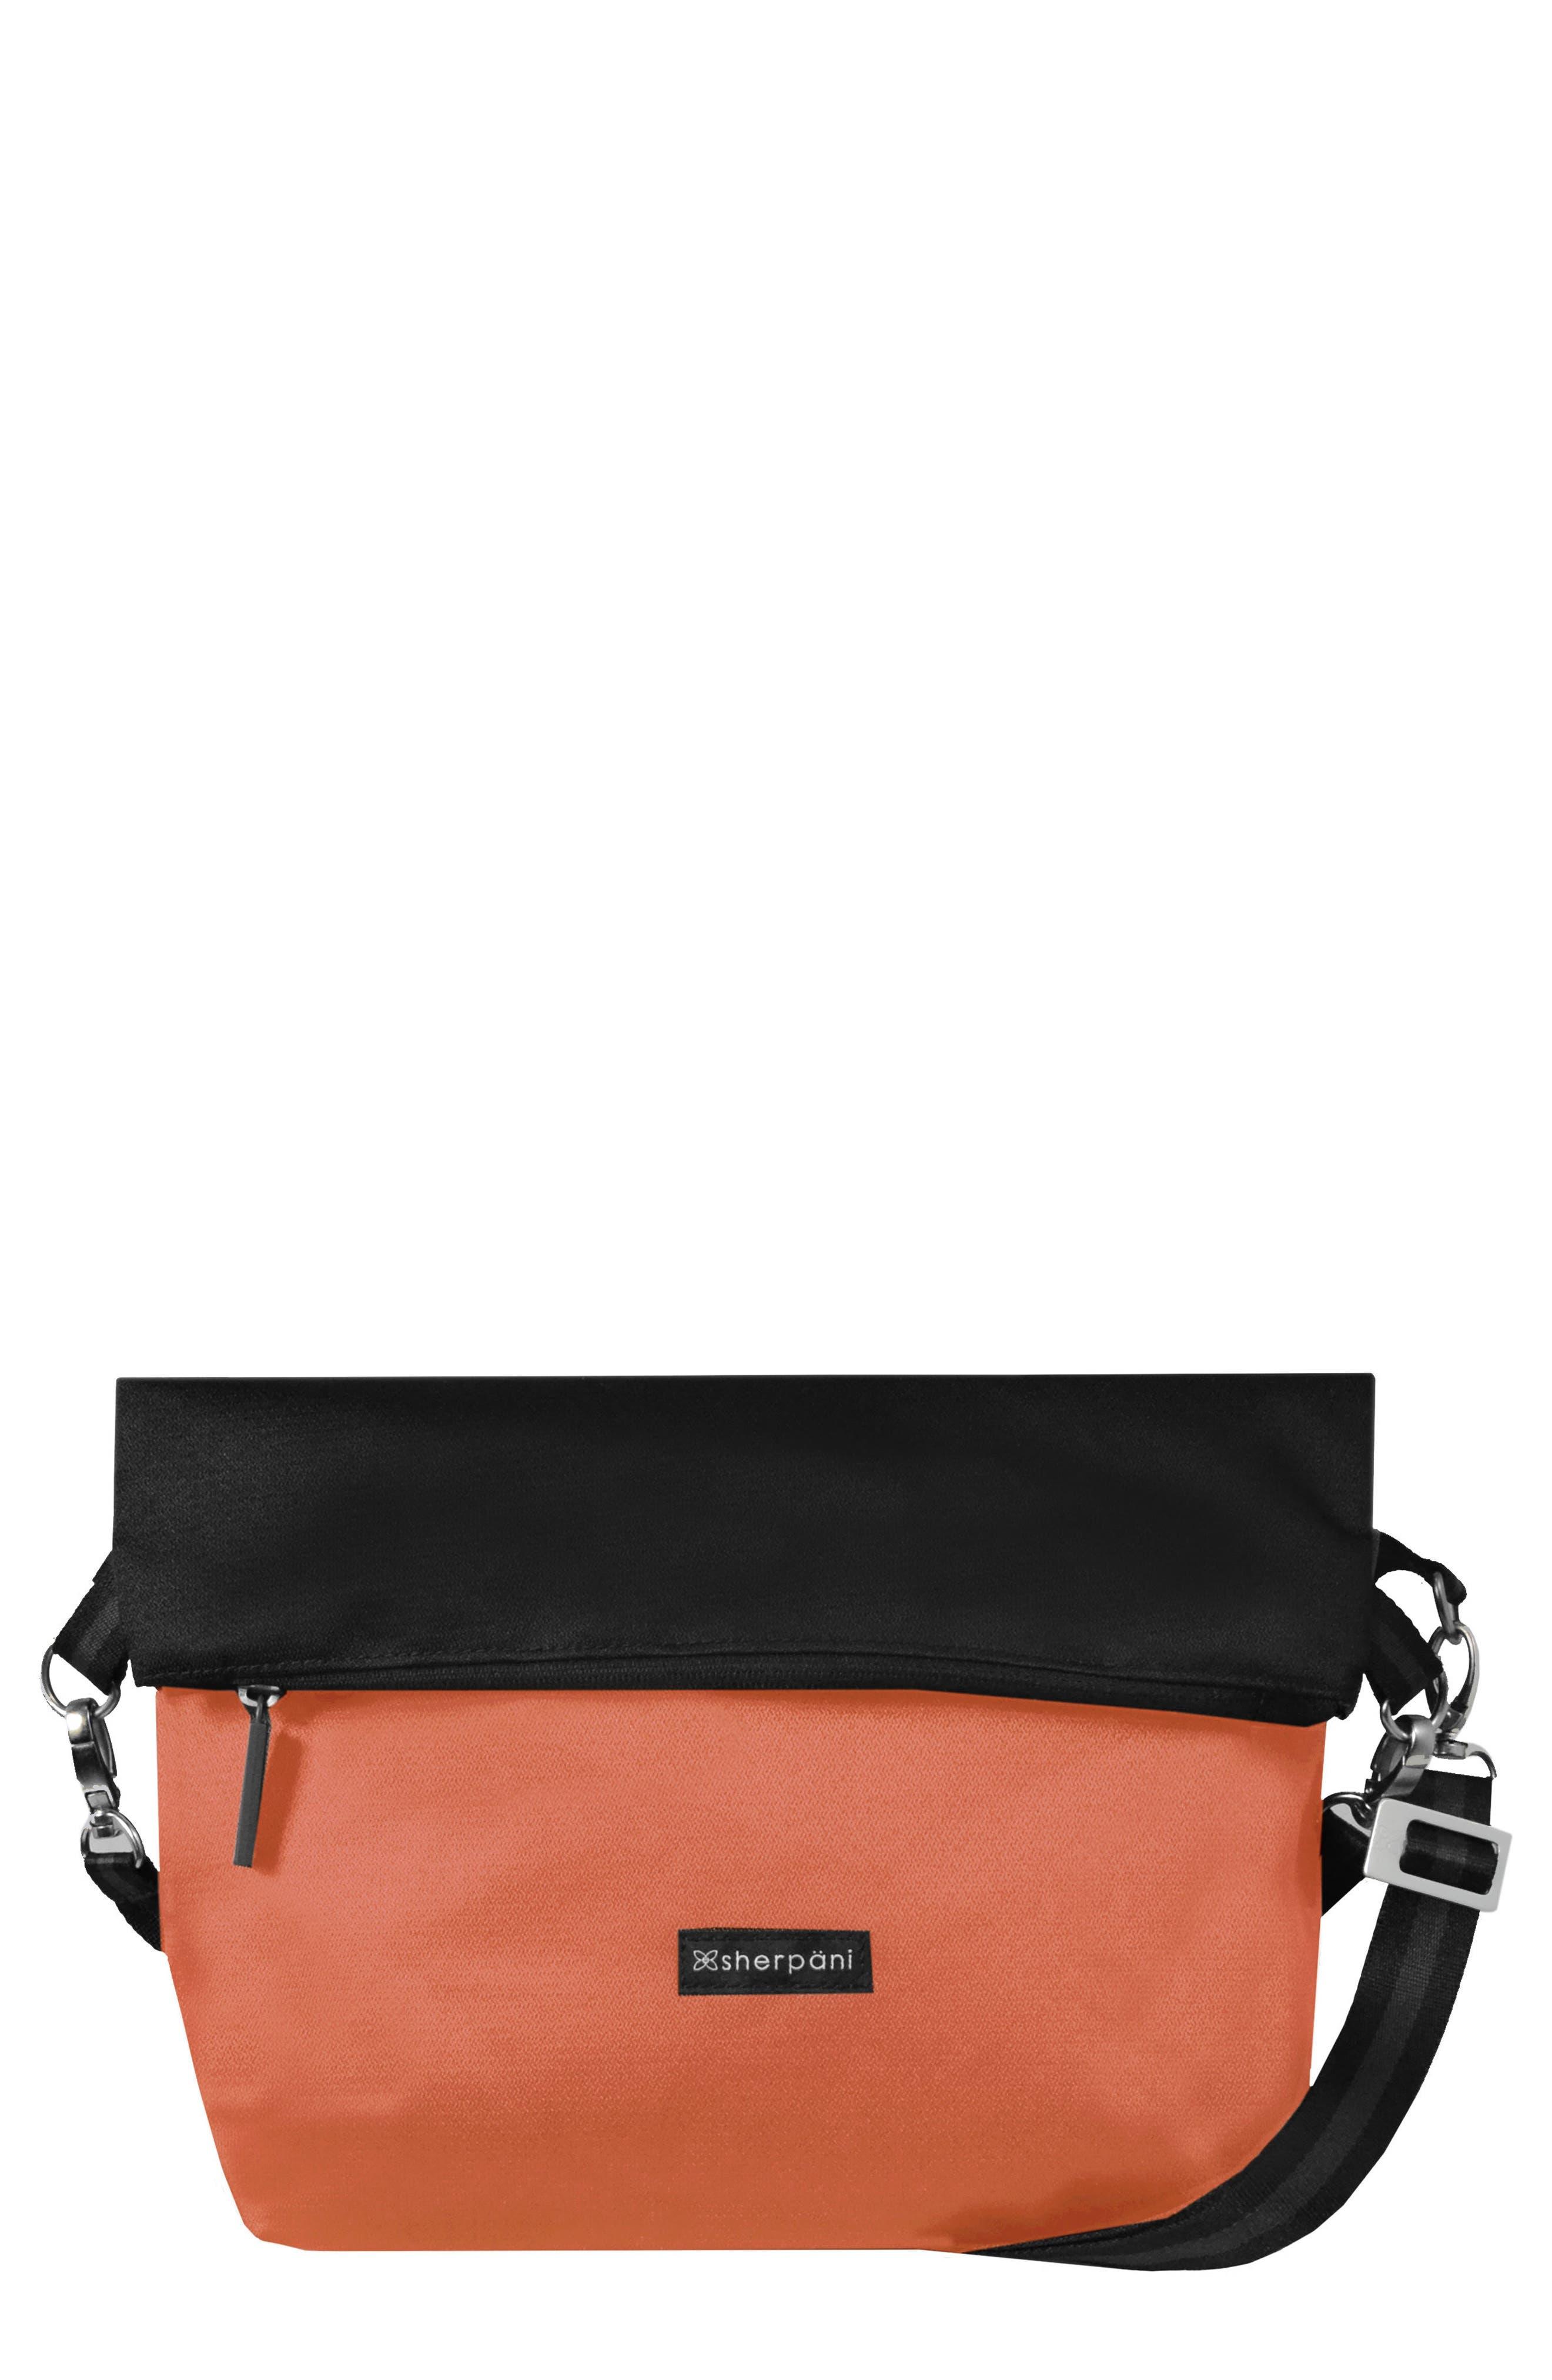 Main Image - Sherpani Vale Reversible Crossbody Bag